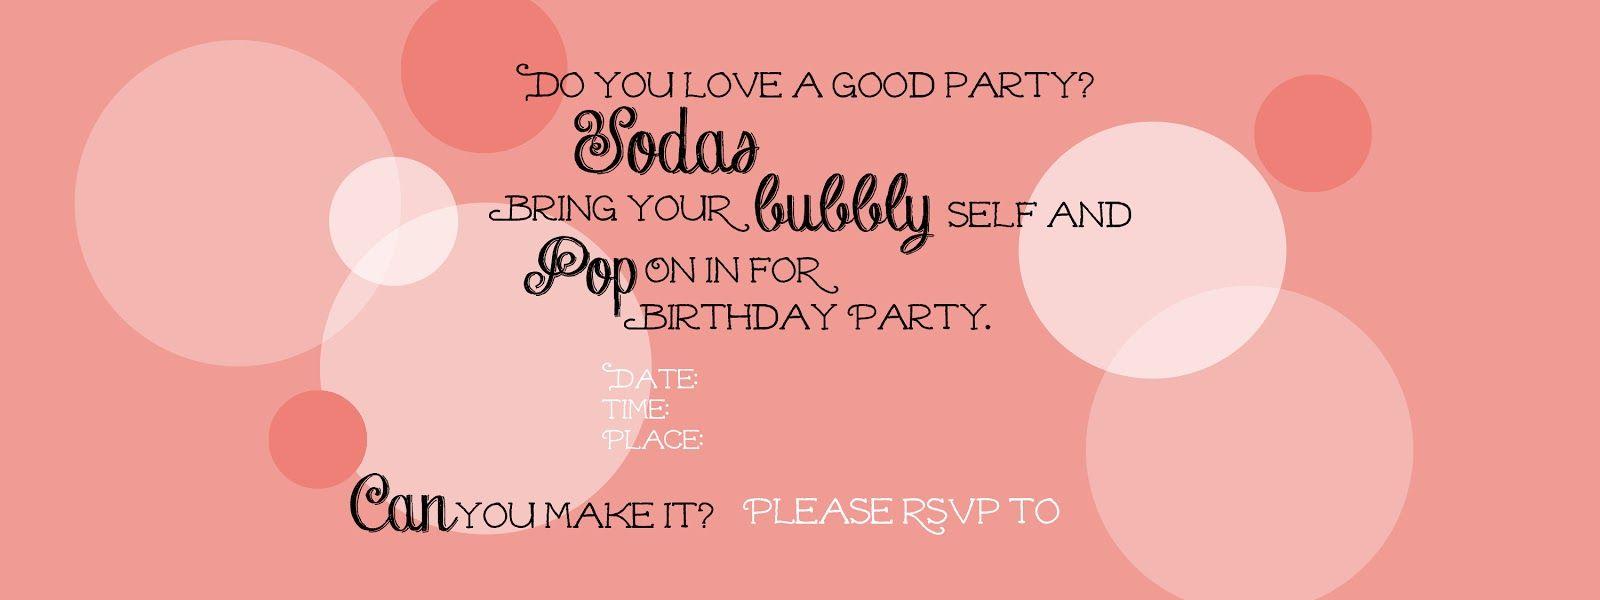 Soda Can Party Invitation {FREE Printable!}   Soda, Party ...